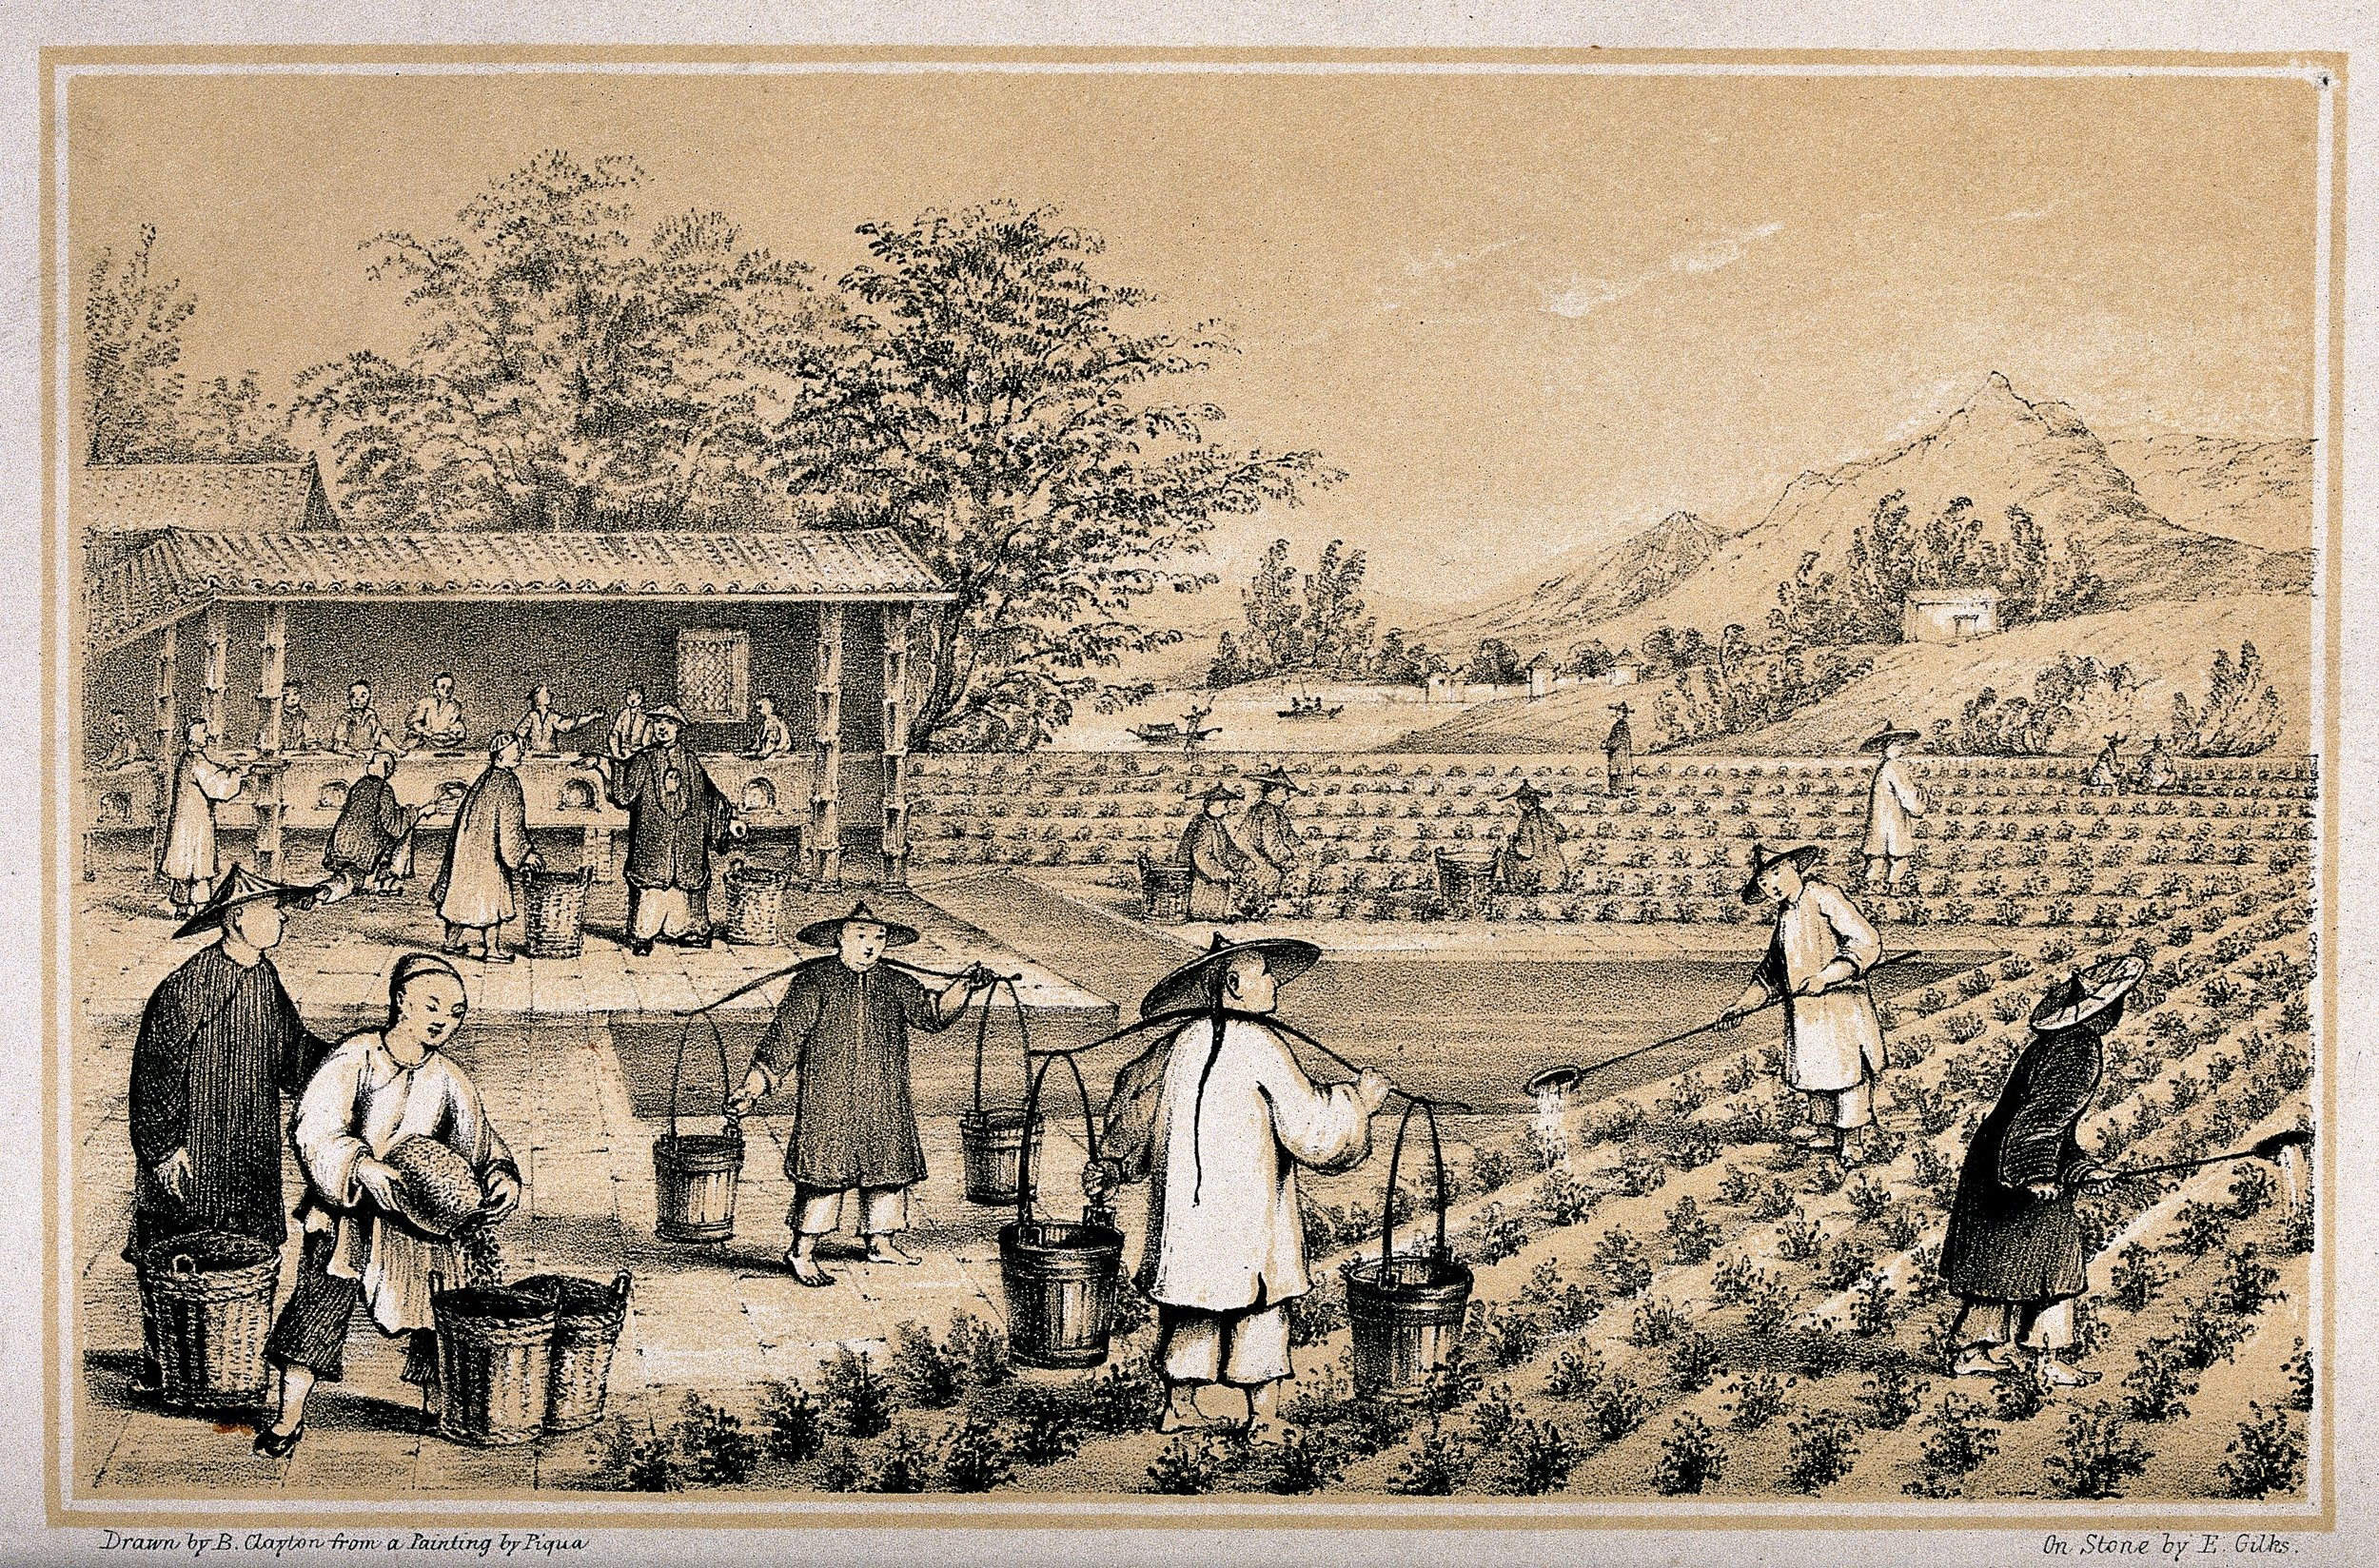 A Chinese Tea Plantation